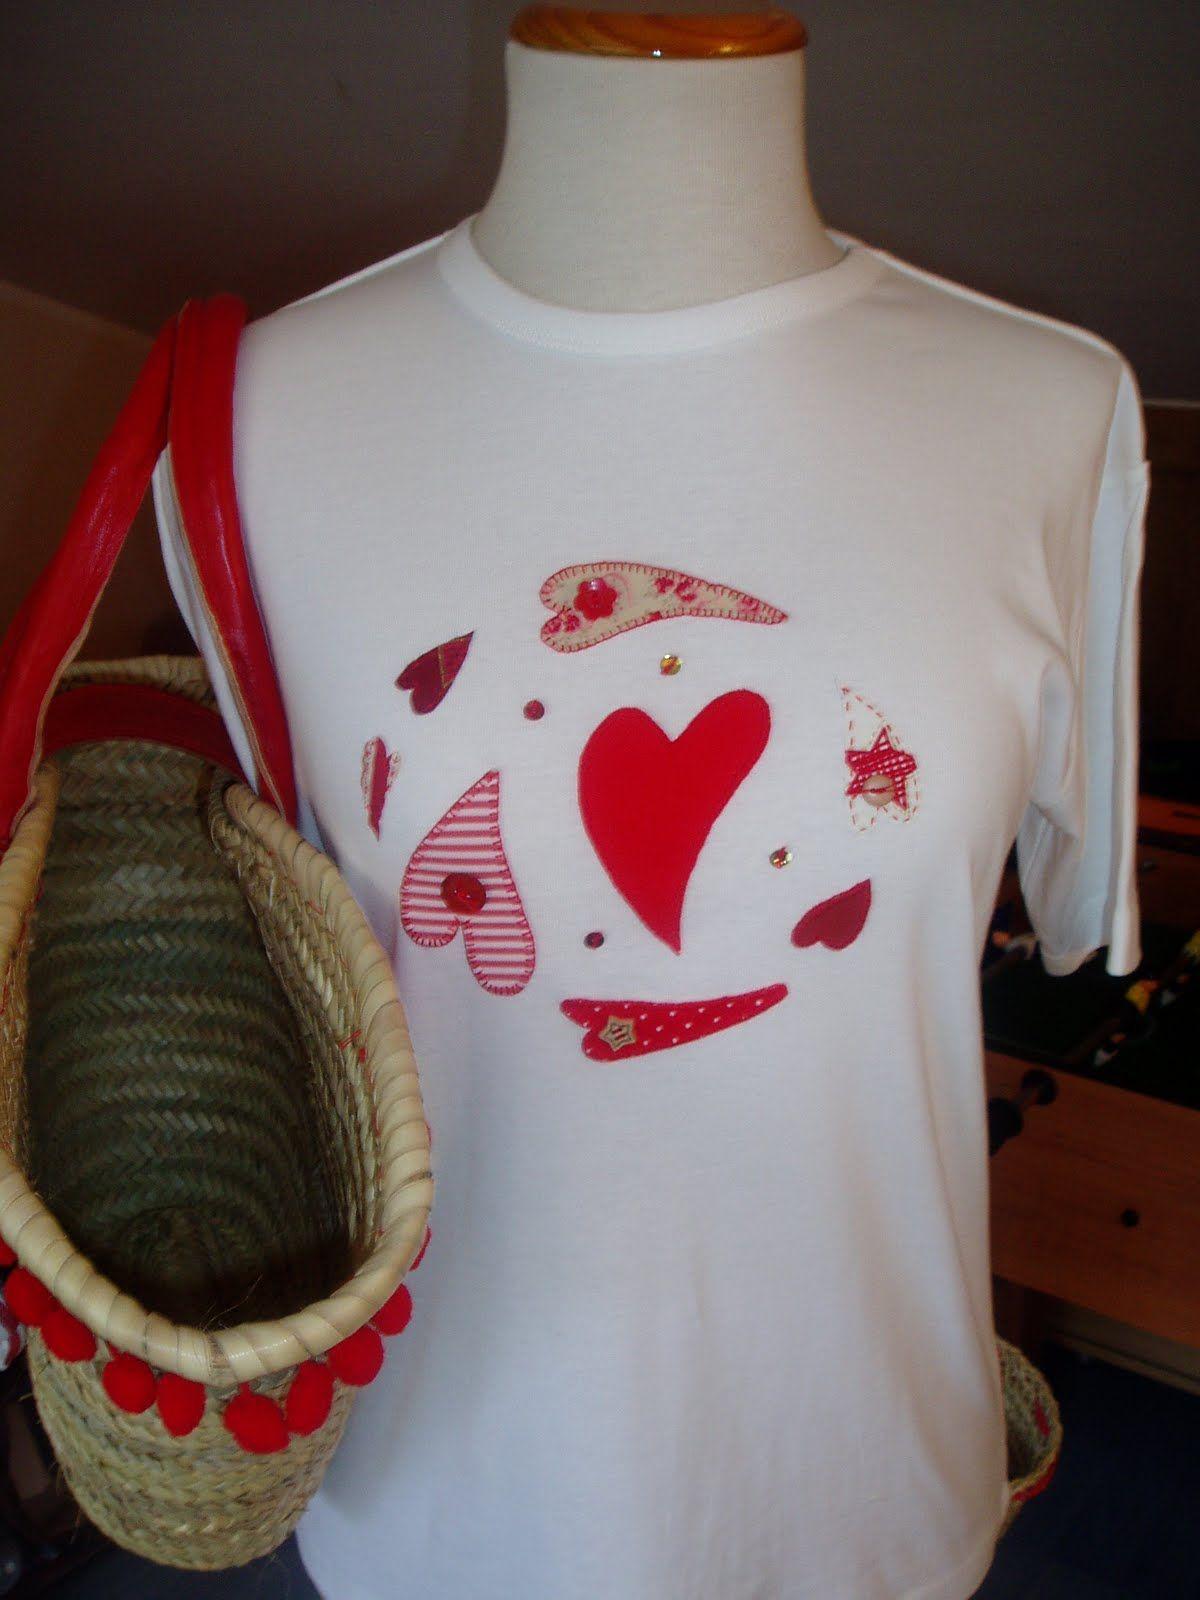 c0ccc7efa3826 Pin de laura albala guerrero en camisetas pintadas